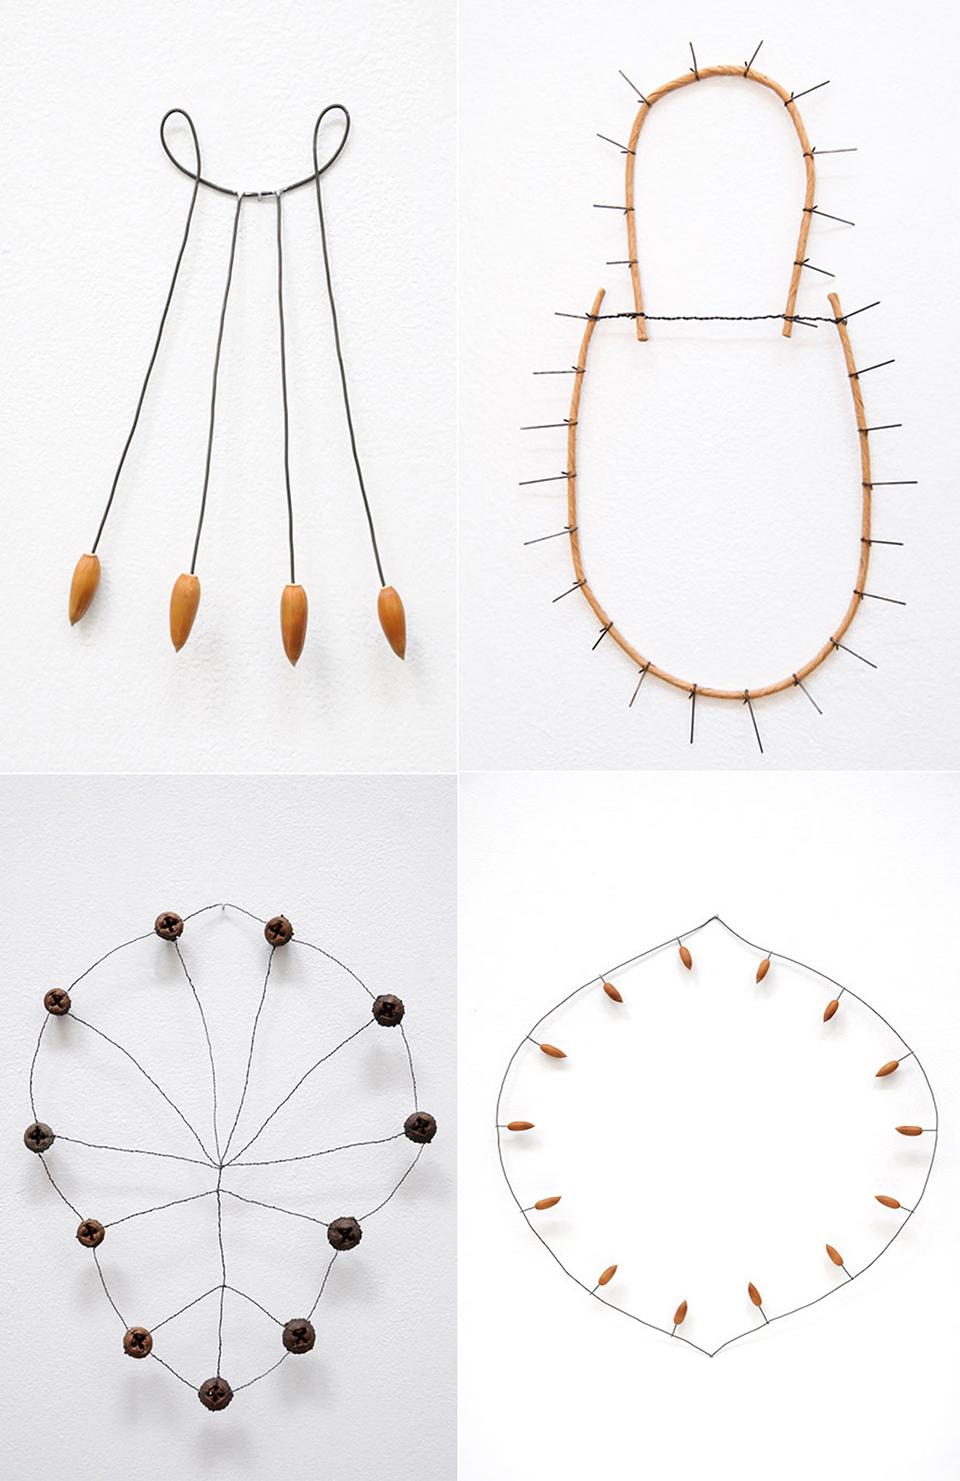 4 wire sculptures